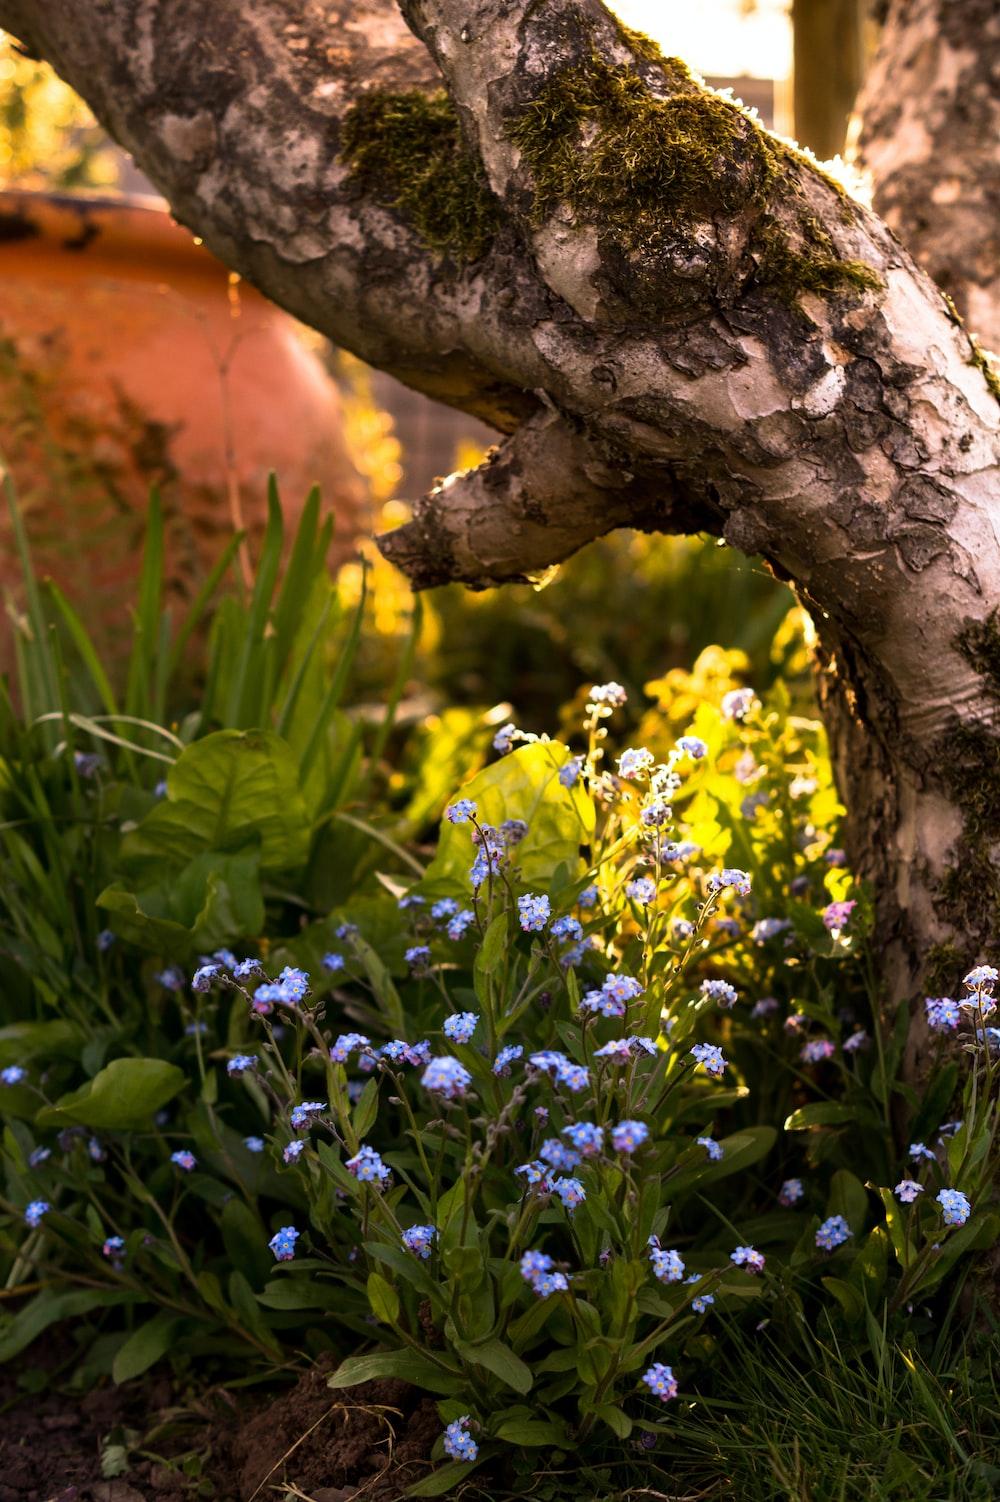 yellow flowers beside brown tree trunk